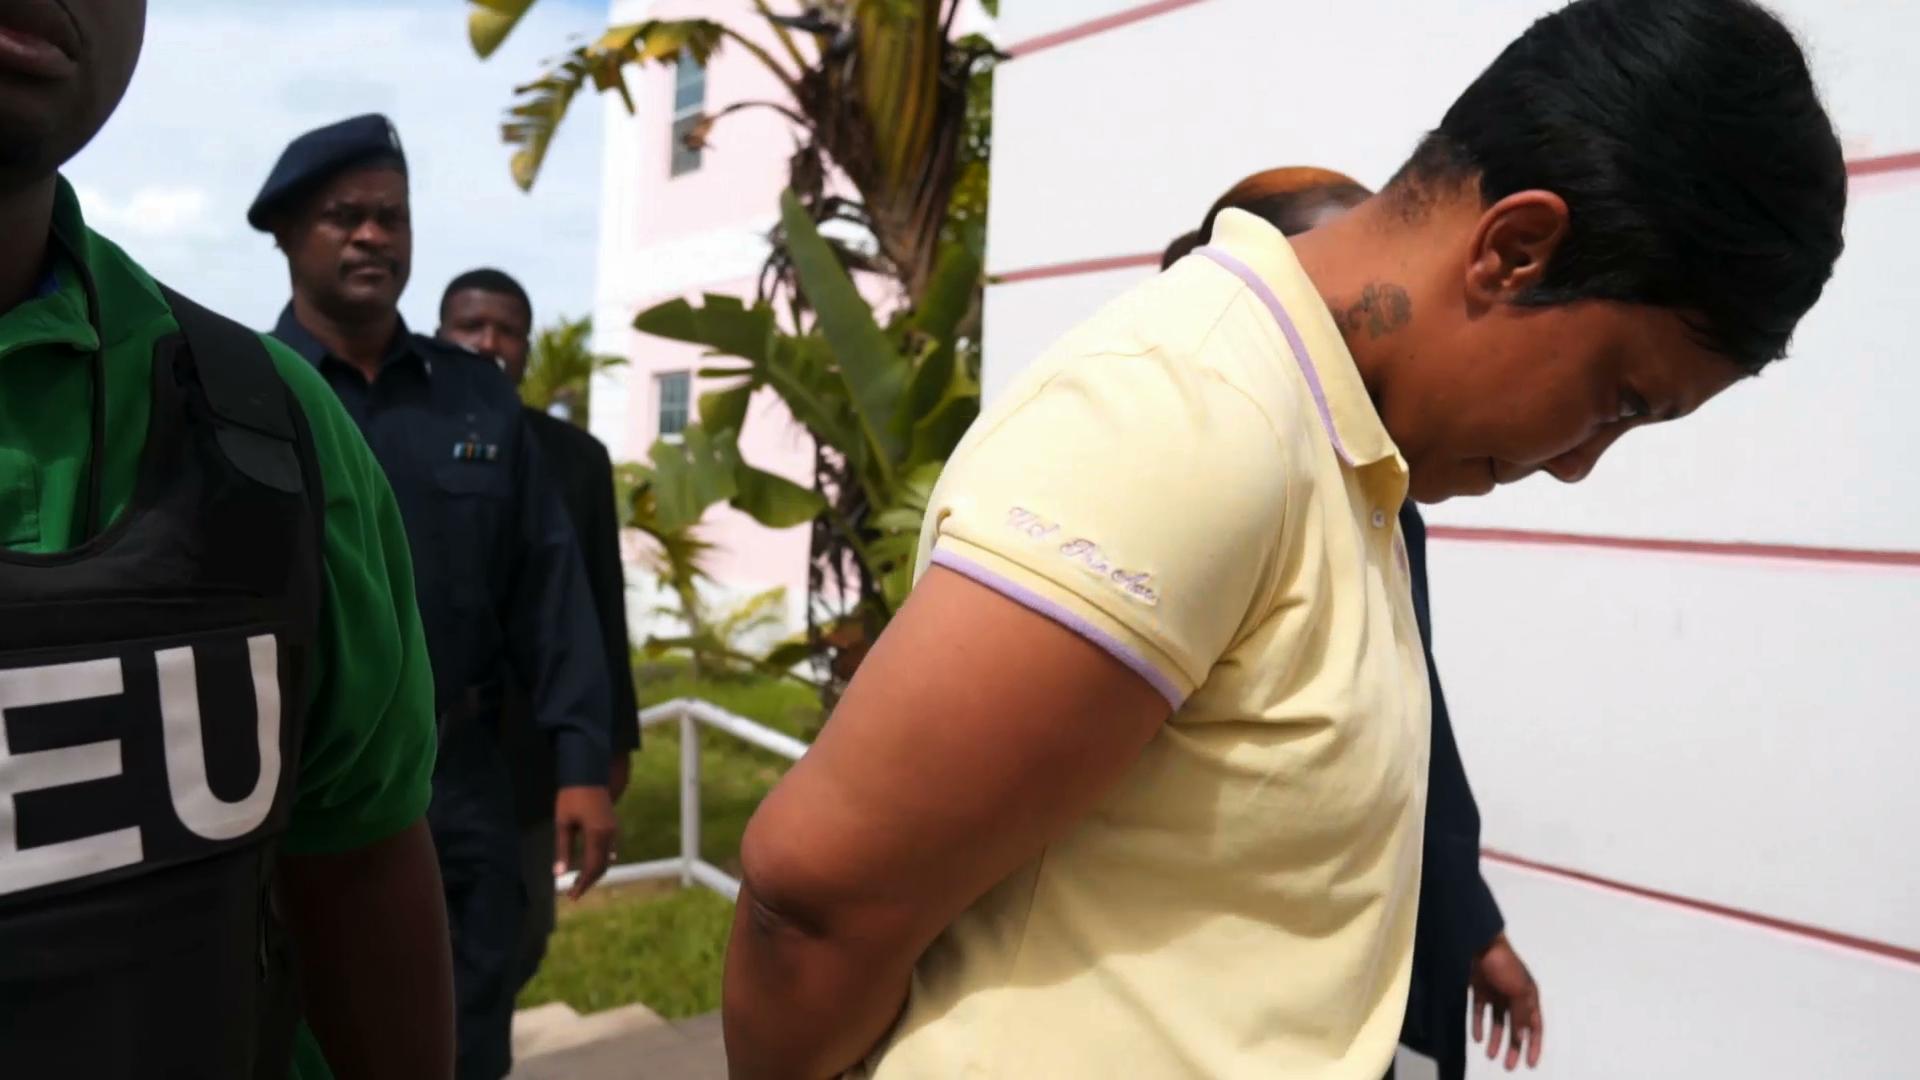 Two arraigned for firearm, drug possession